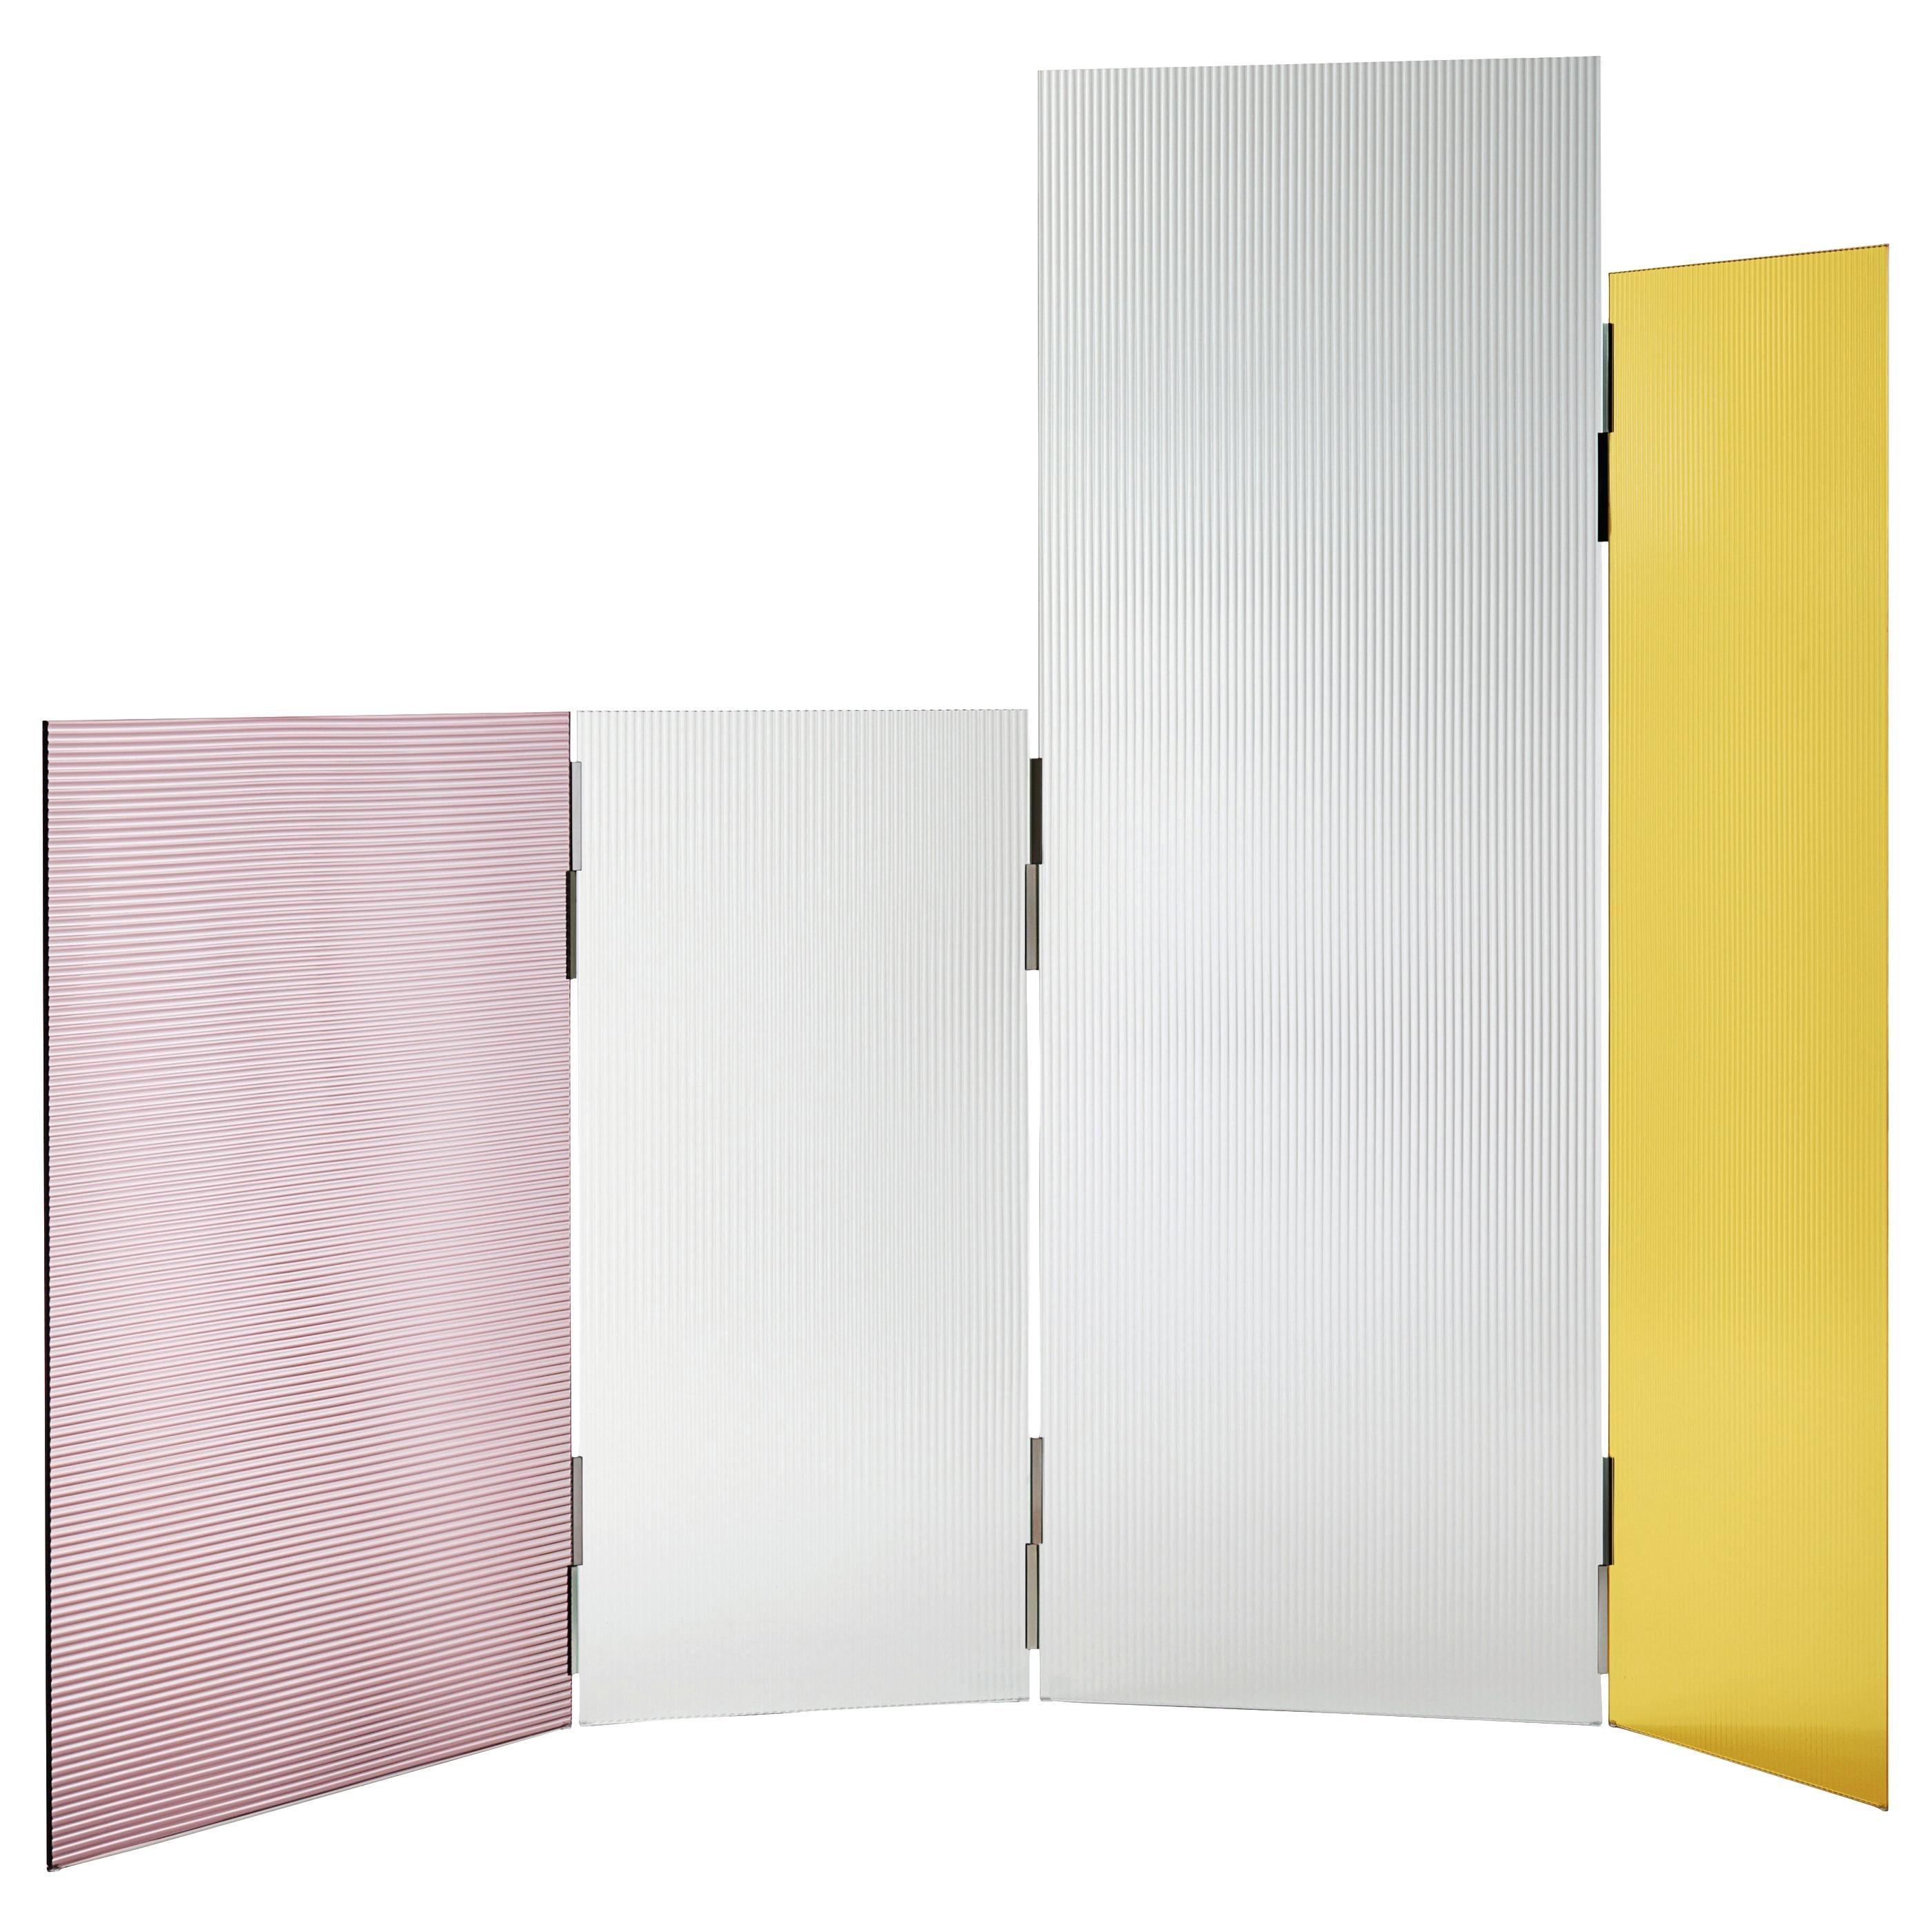 Rayures Modular Screen Panels, by Ronan & Erwan Bouroullec for Glas Italia